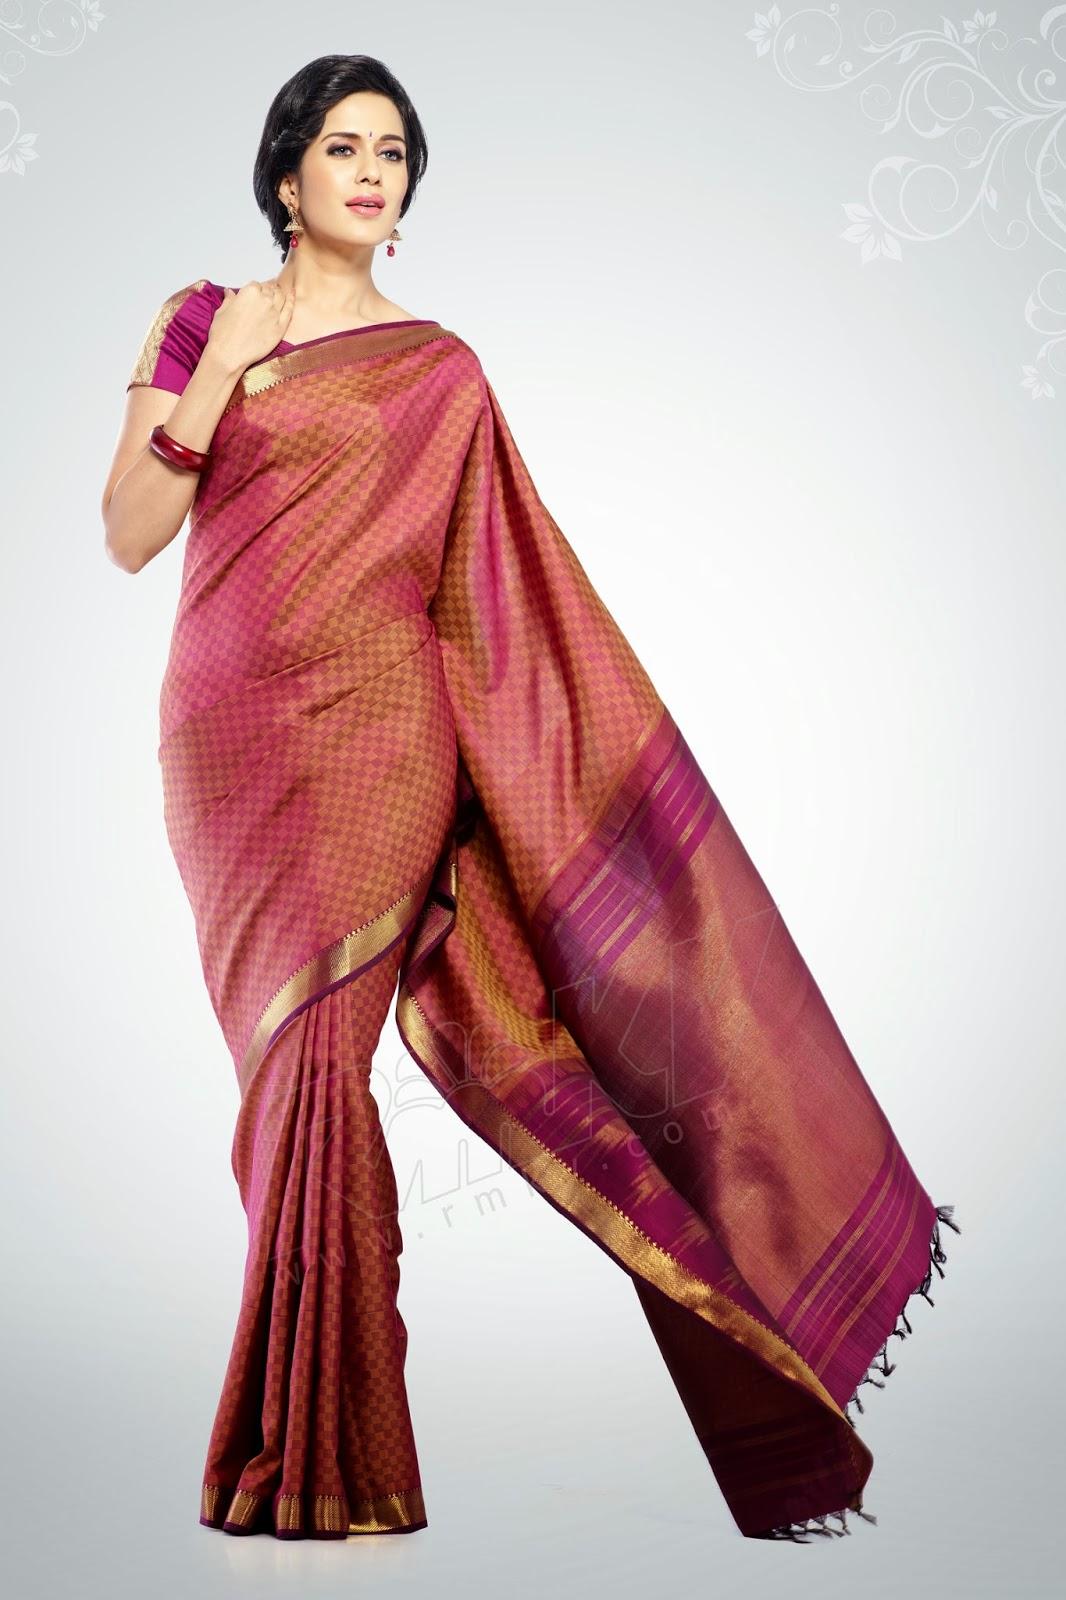 Rmkv silks in bangalore dating